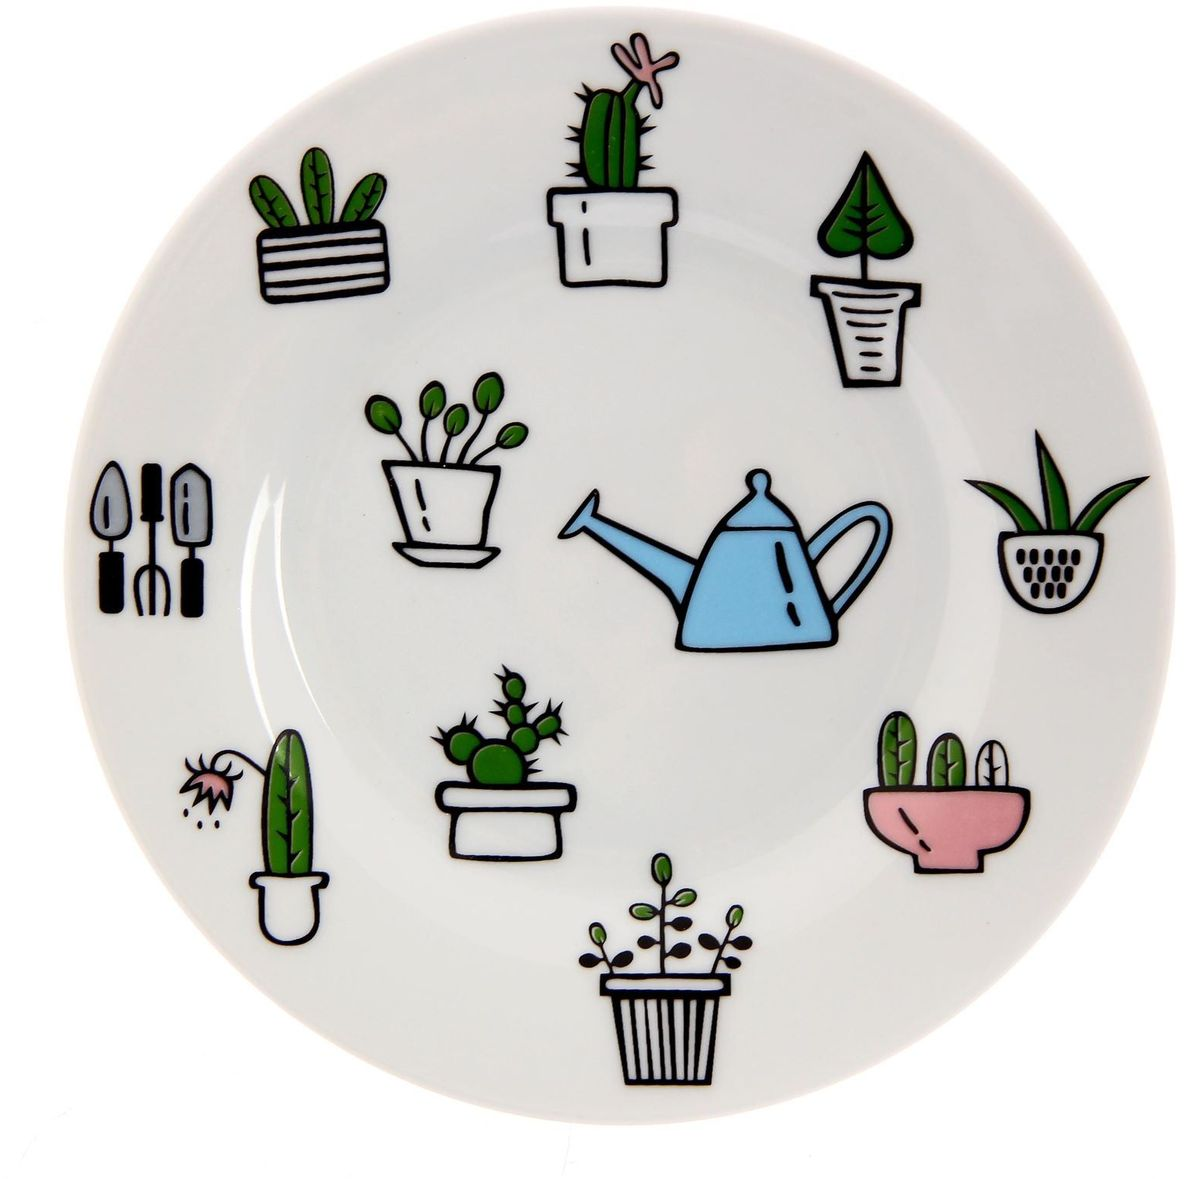 Тарелка мелкая Сотвори чудо Домашний сад, диаметр 15,5 см тарелка мелкая сотвори чудо полярный мишка диаметр 20 см